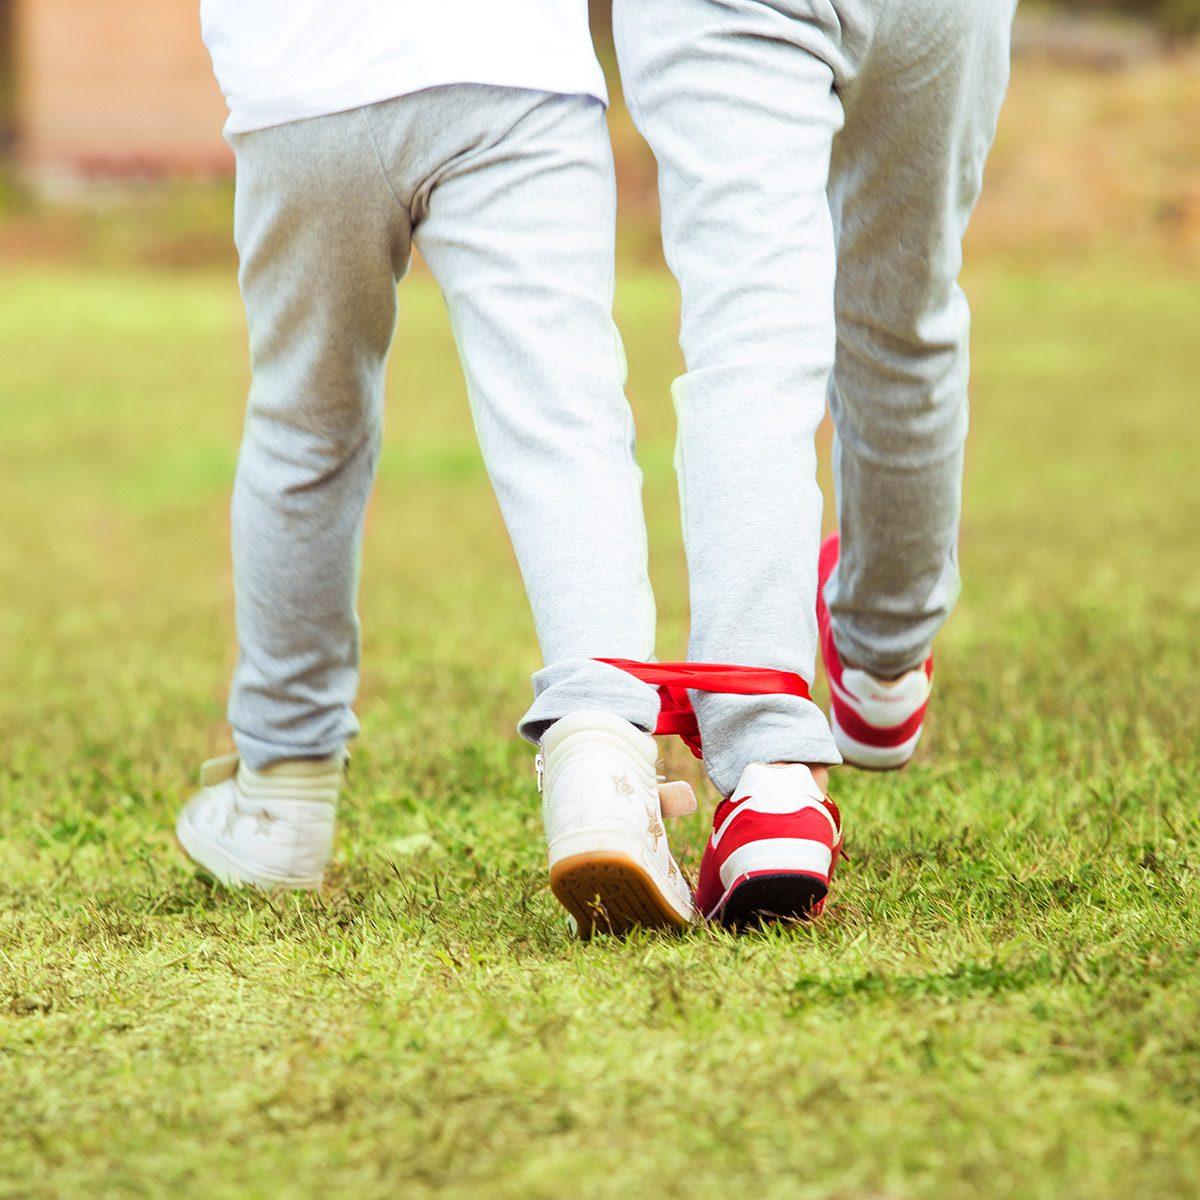 Children to be three-legged race game